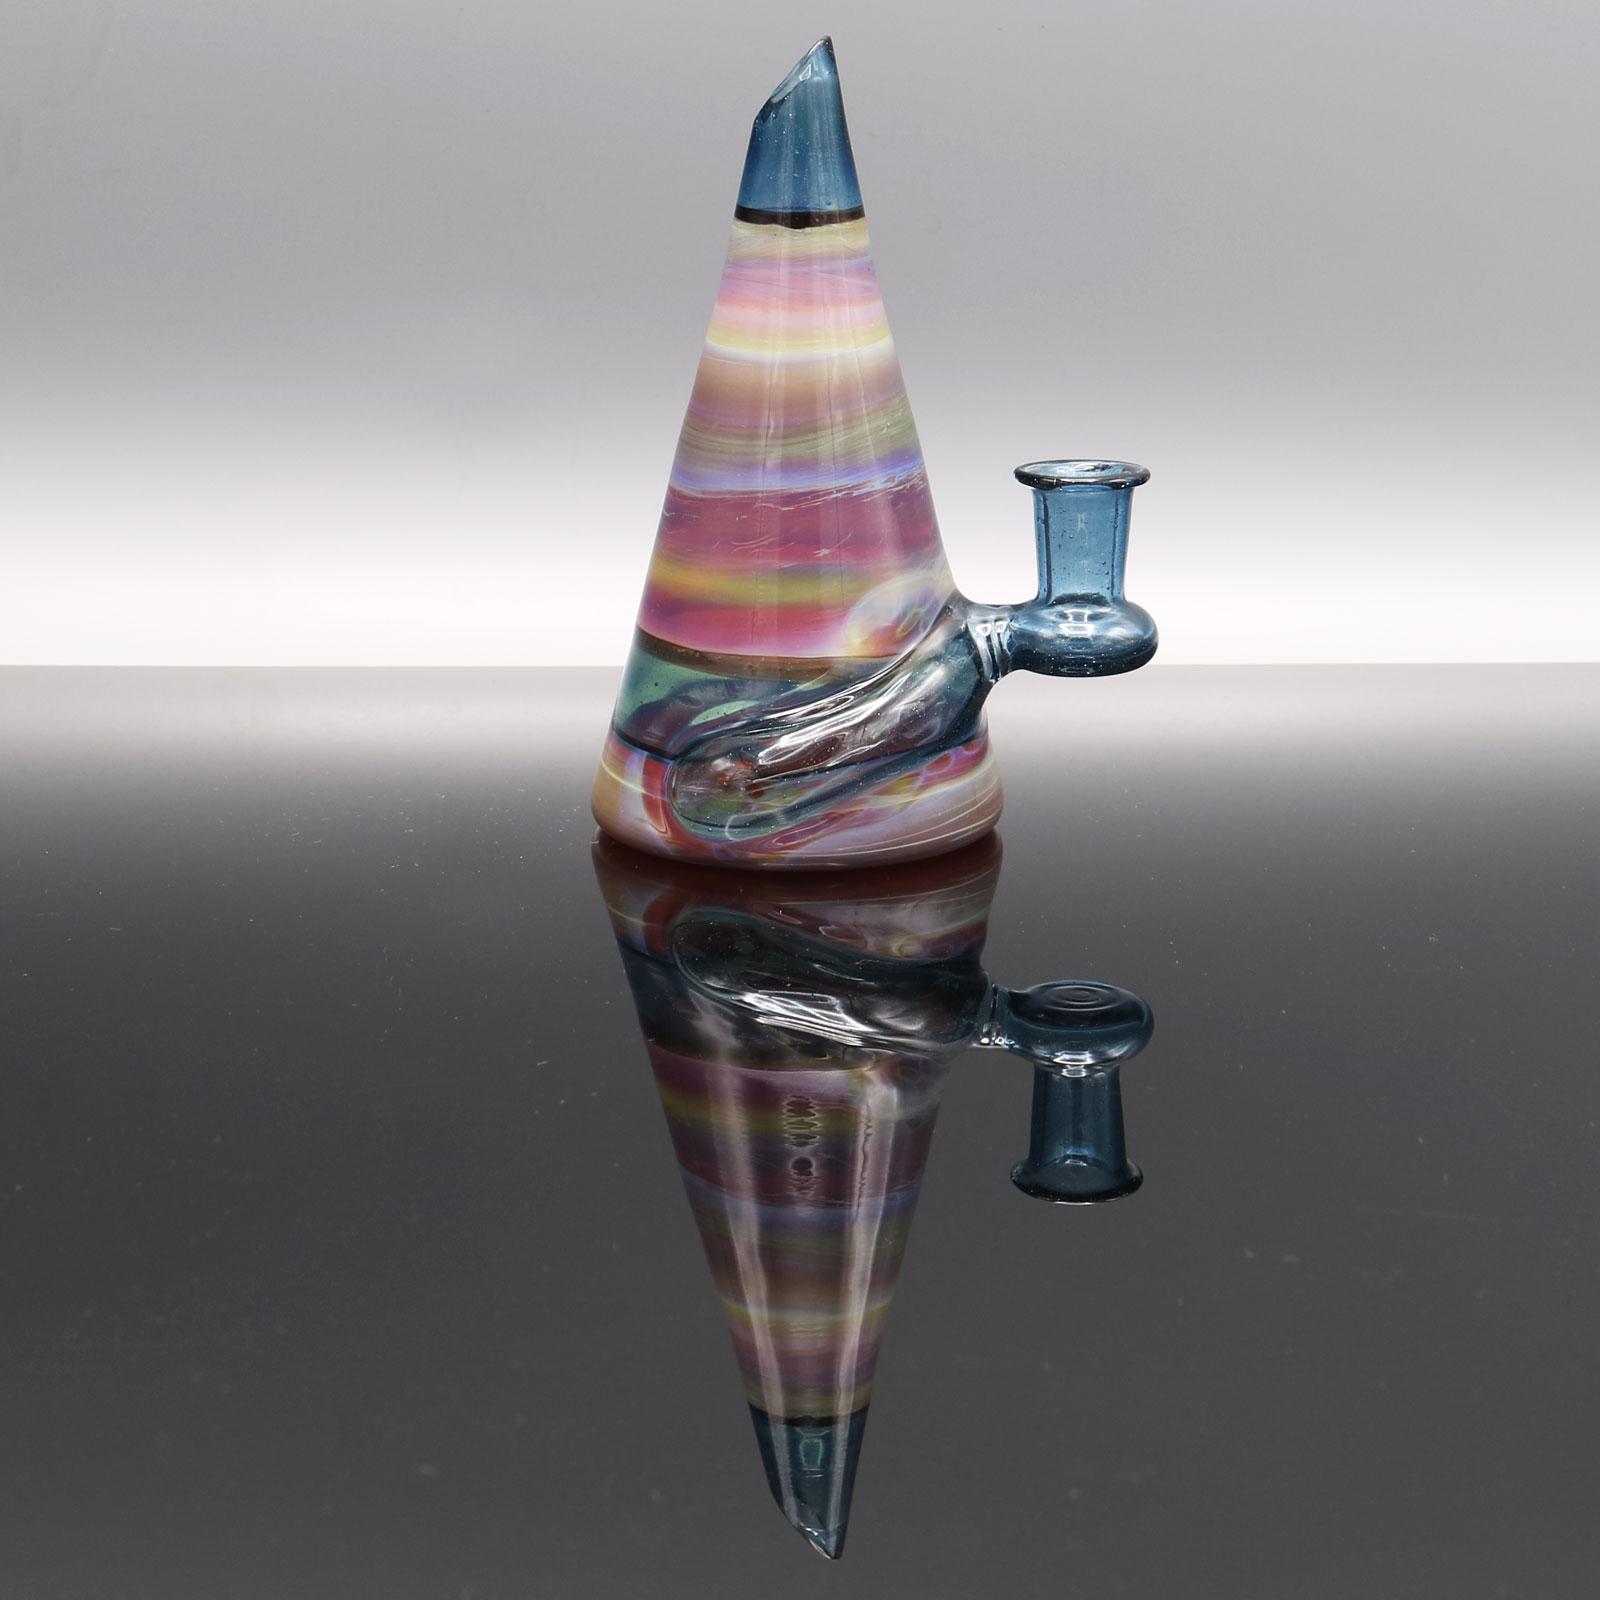 Unlmtd Glass – The Cone